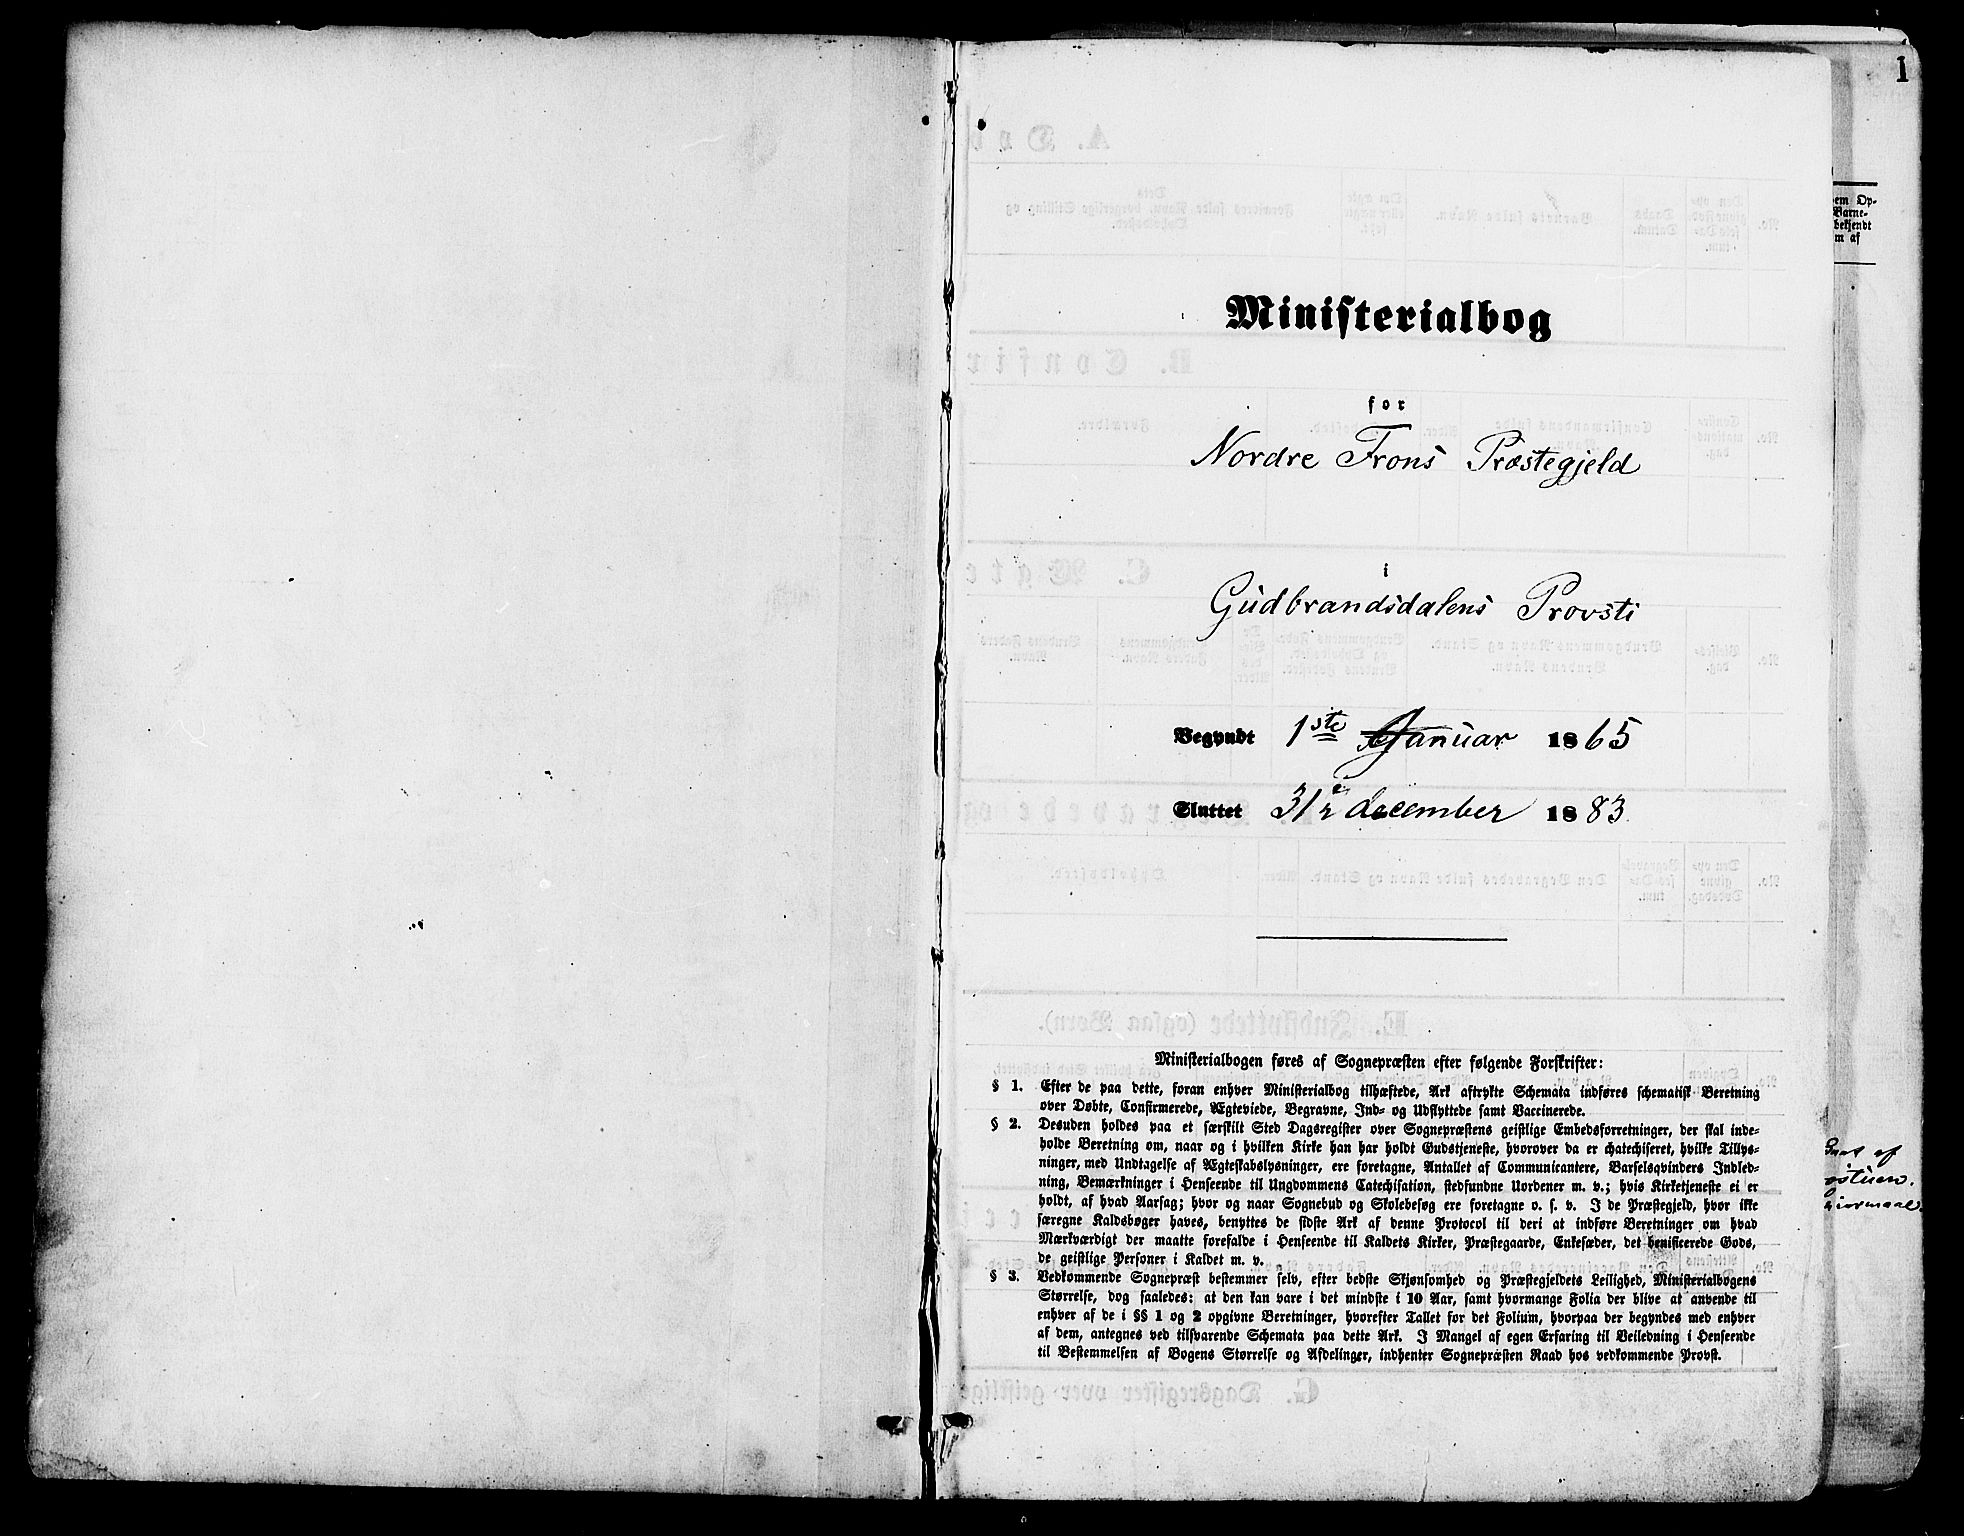 SAH, Nord-Fron prestekontor, Ministerialbok nr. 2, 1865-1883